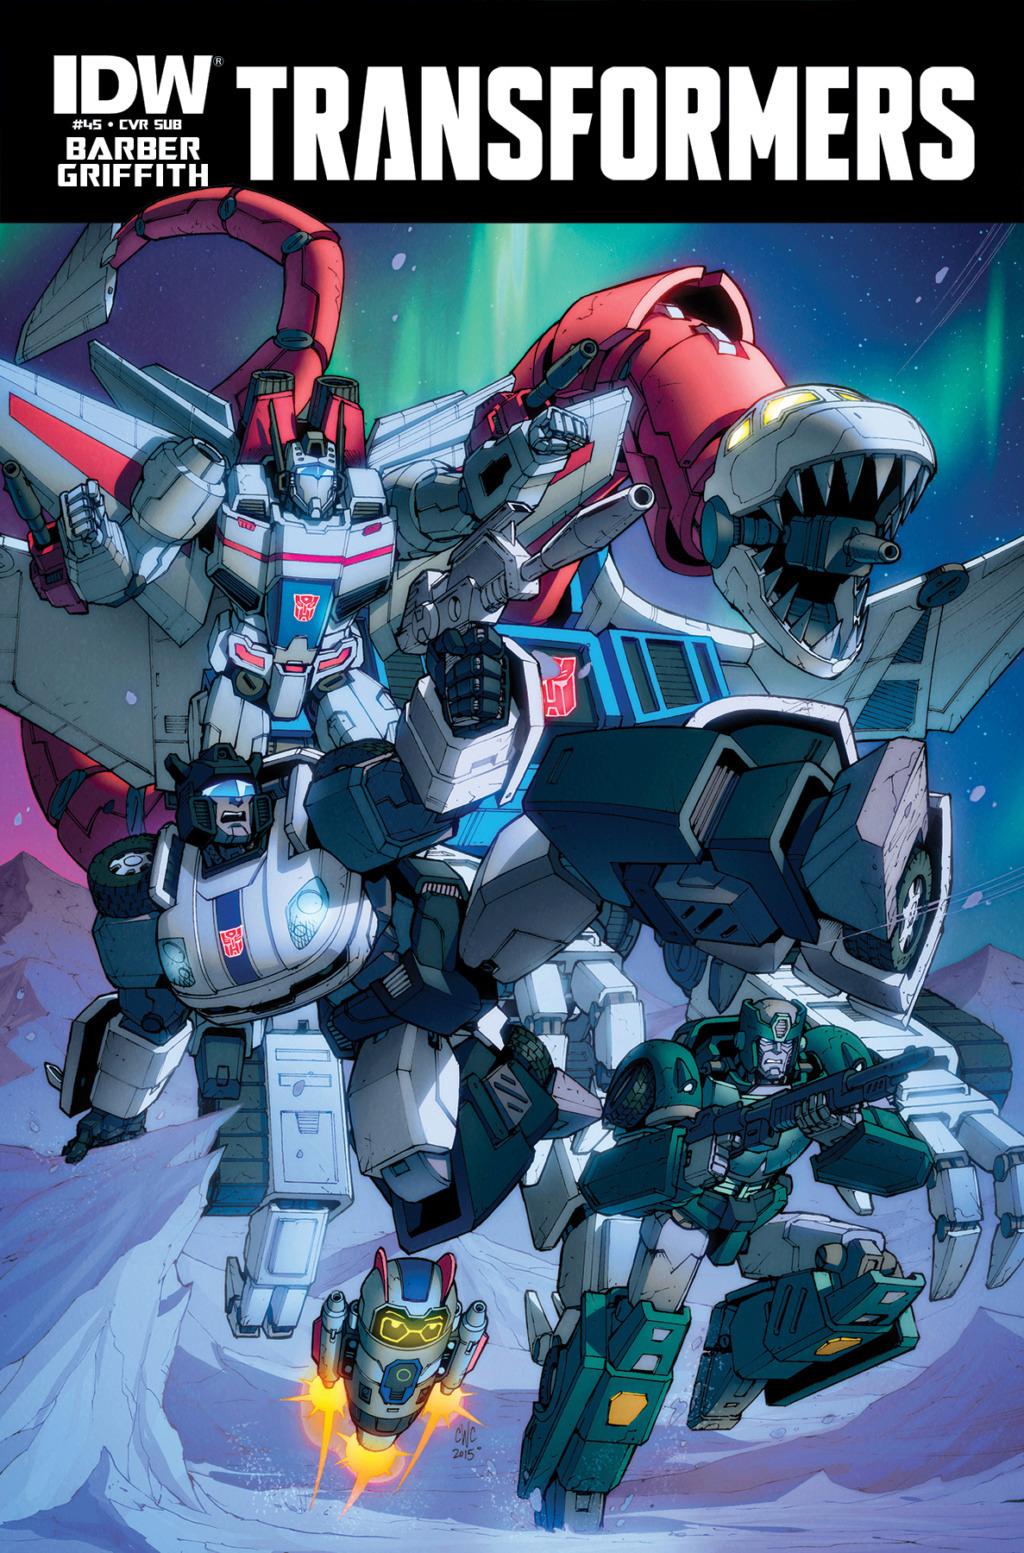 Jouets Transformers Generations: Nouveautés Hasbro - Page 6 Tf_rid10